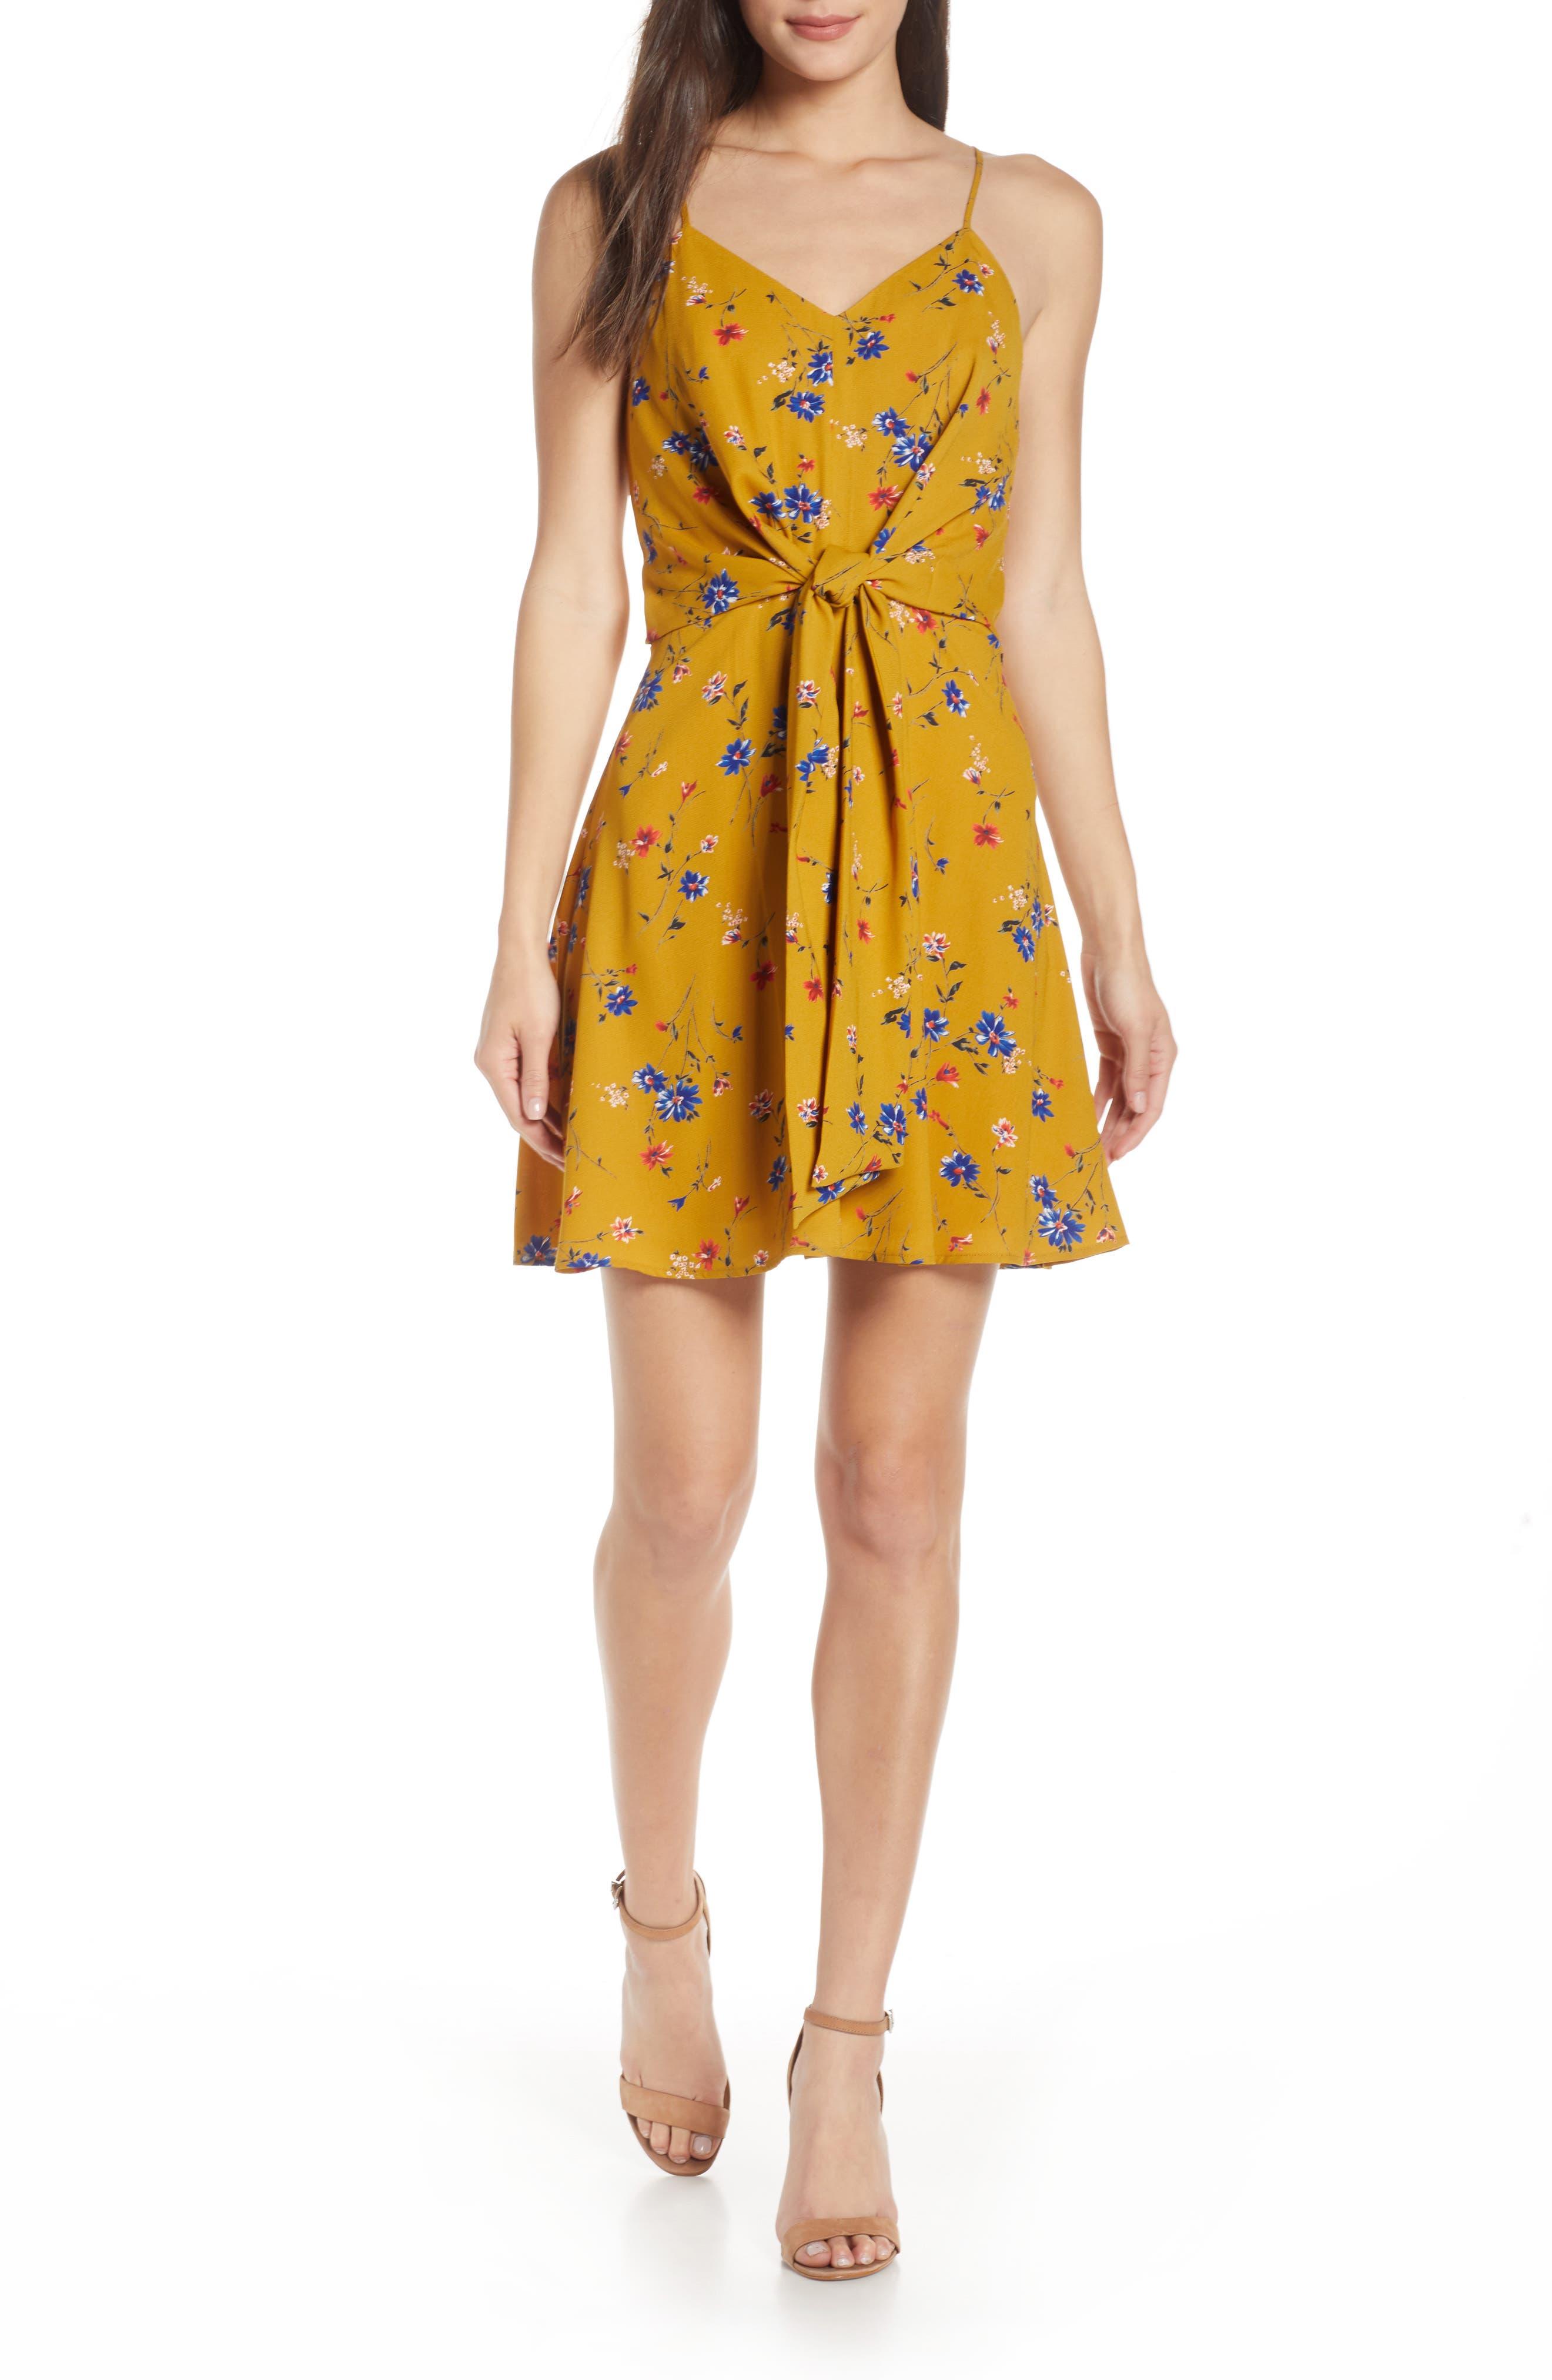 19 COOPER Floral Print Tie Front Dress, Main, color, MUSTARD FLORAL